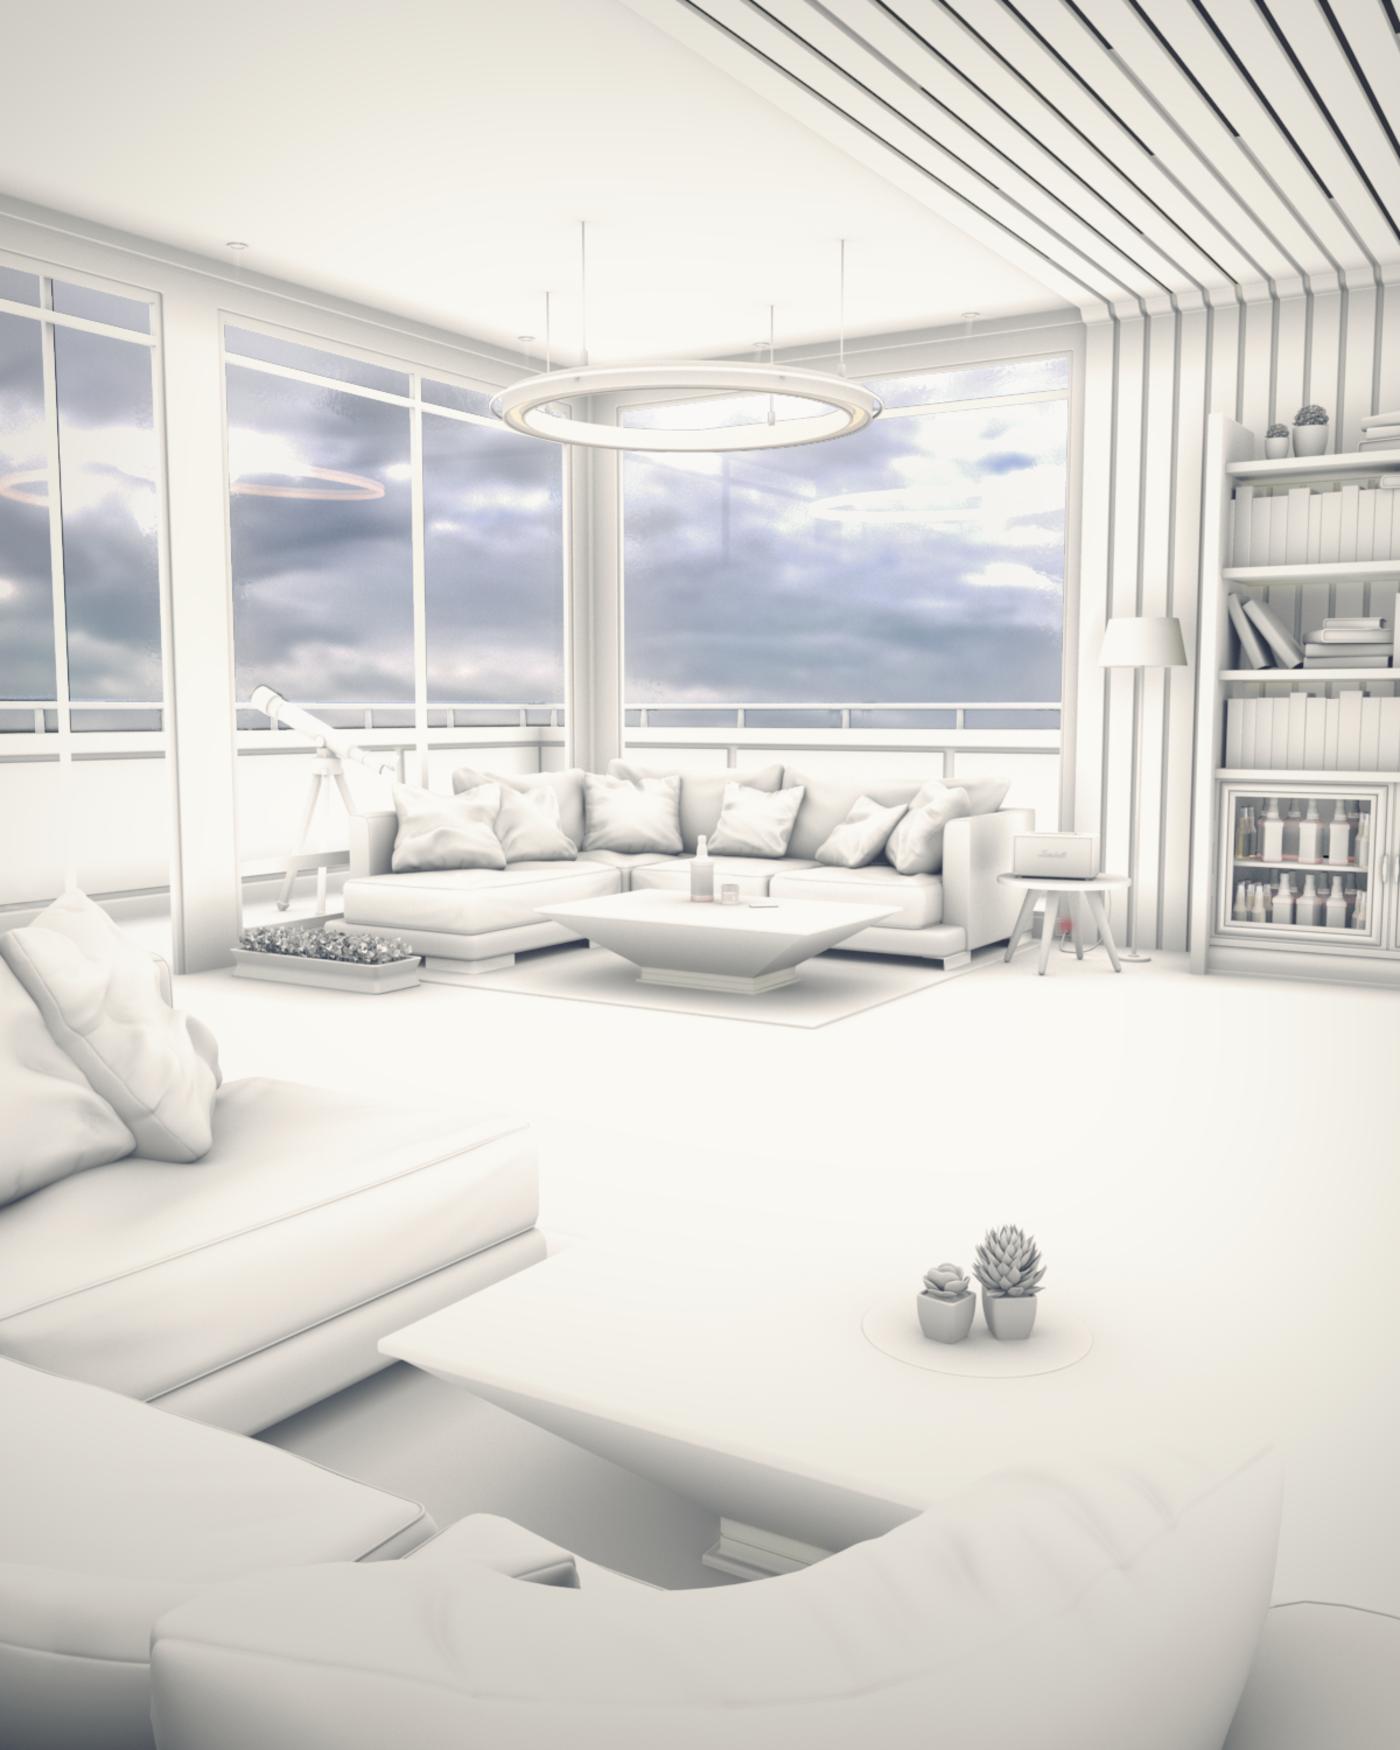 Lonesome Bedroom [AO] - Quarantine Art - 01